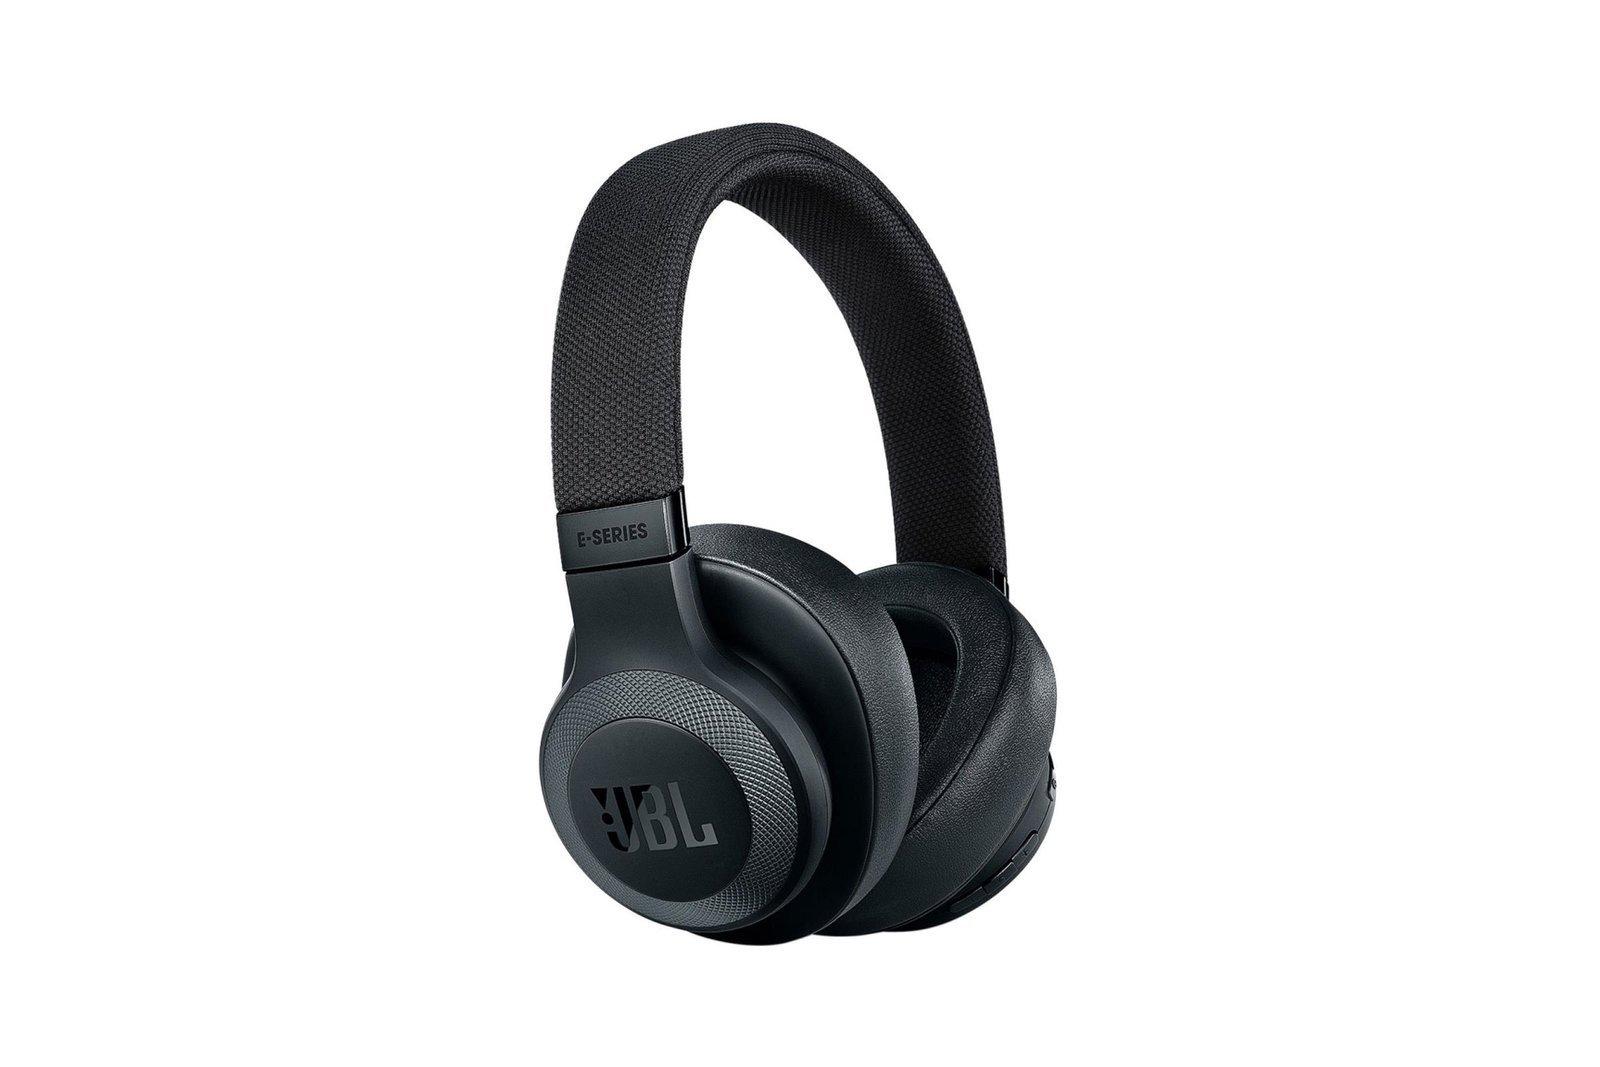 NEW JBL E65BTNC Headphones Wireless Bluetooth Over-Ear Black Headset